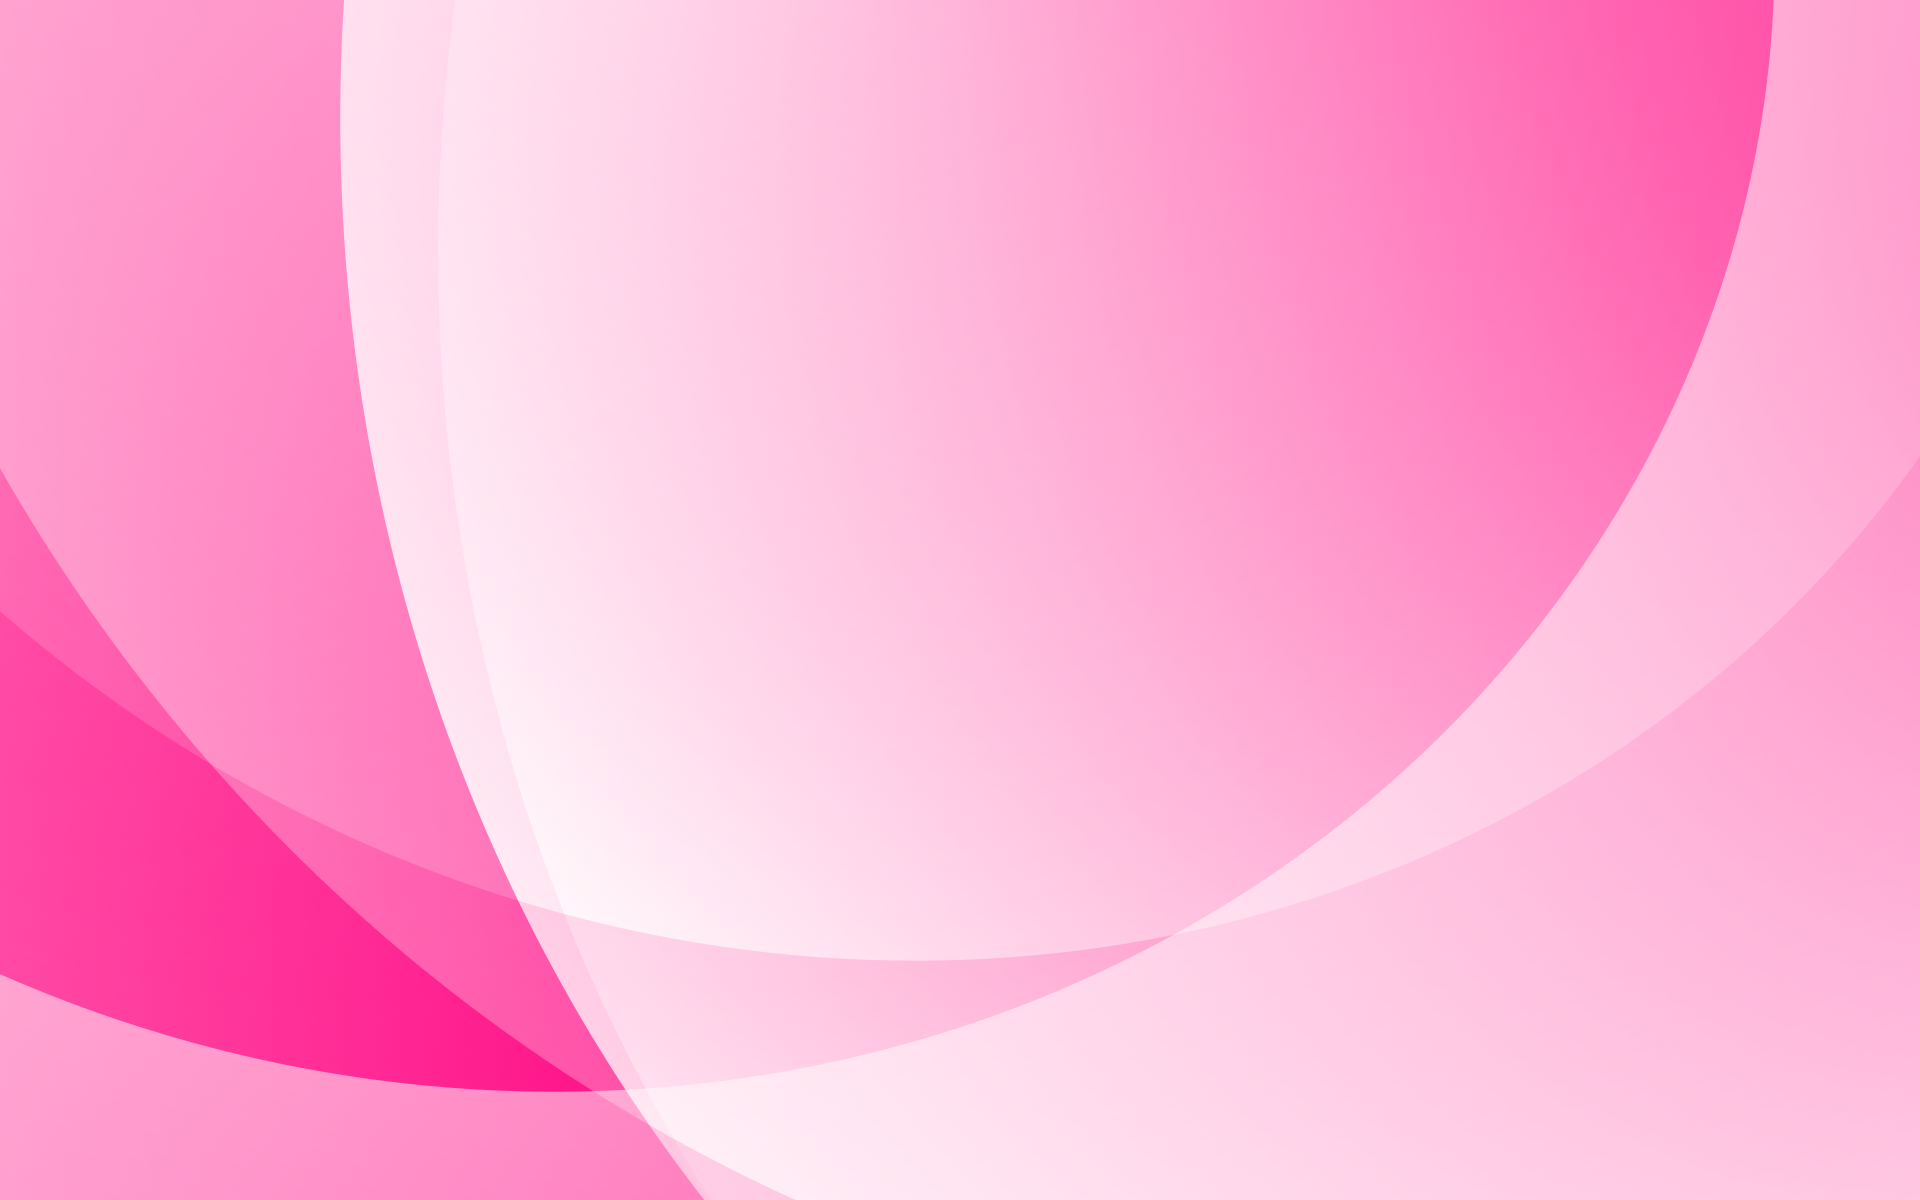 light pink abstract wallpaper img pinterest pink